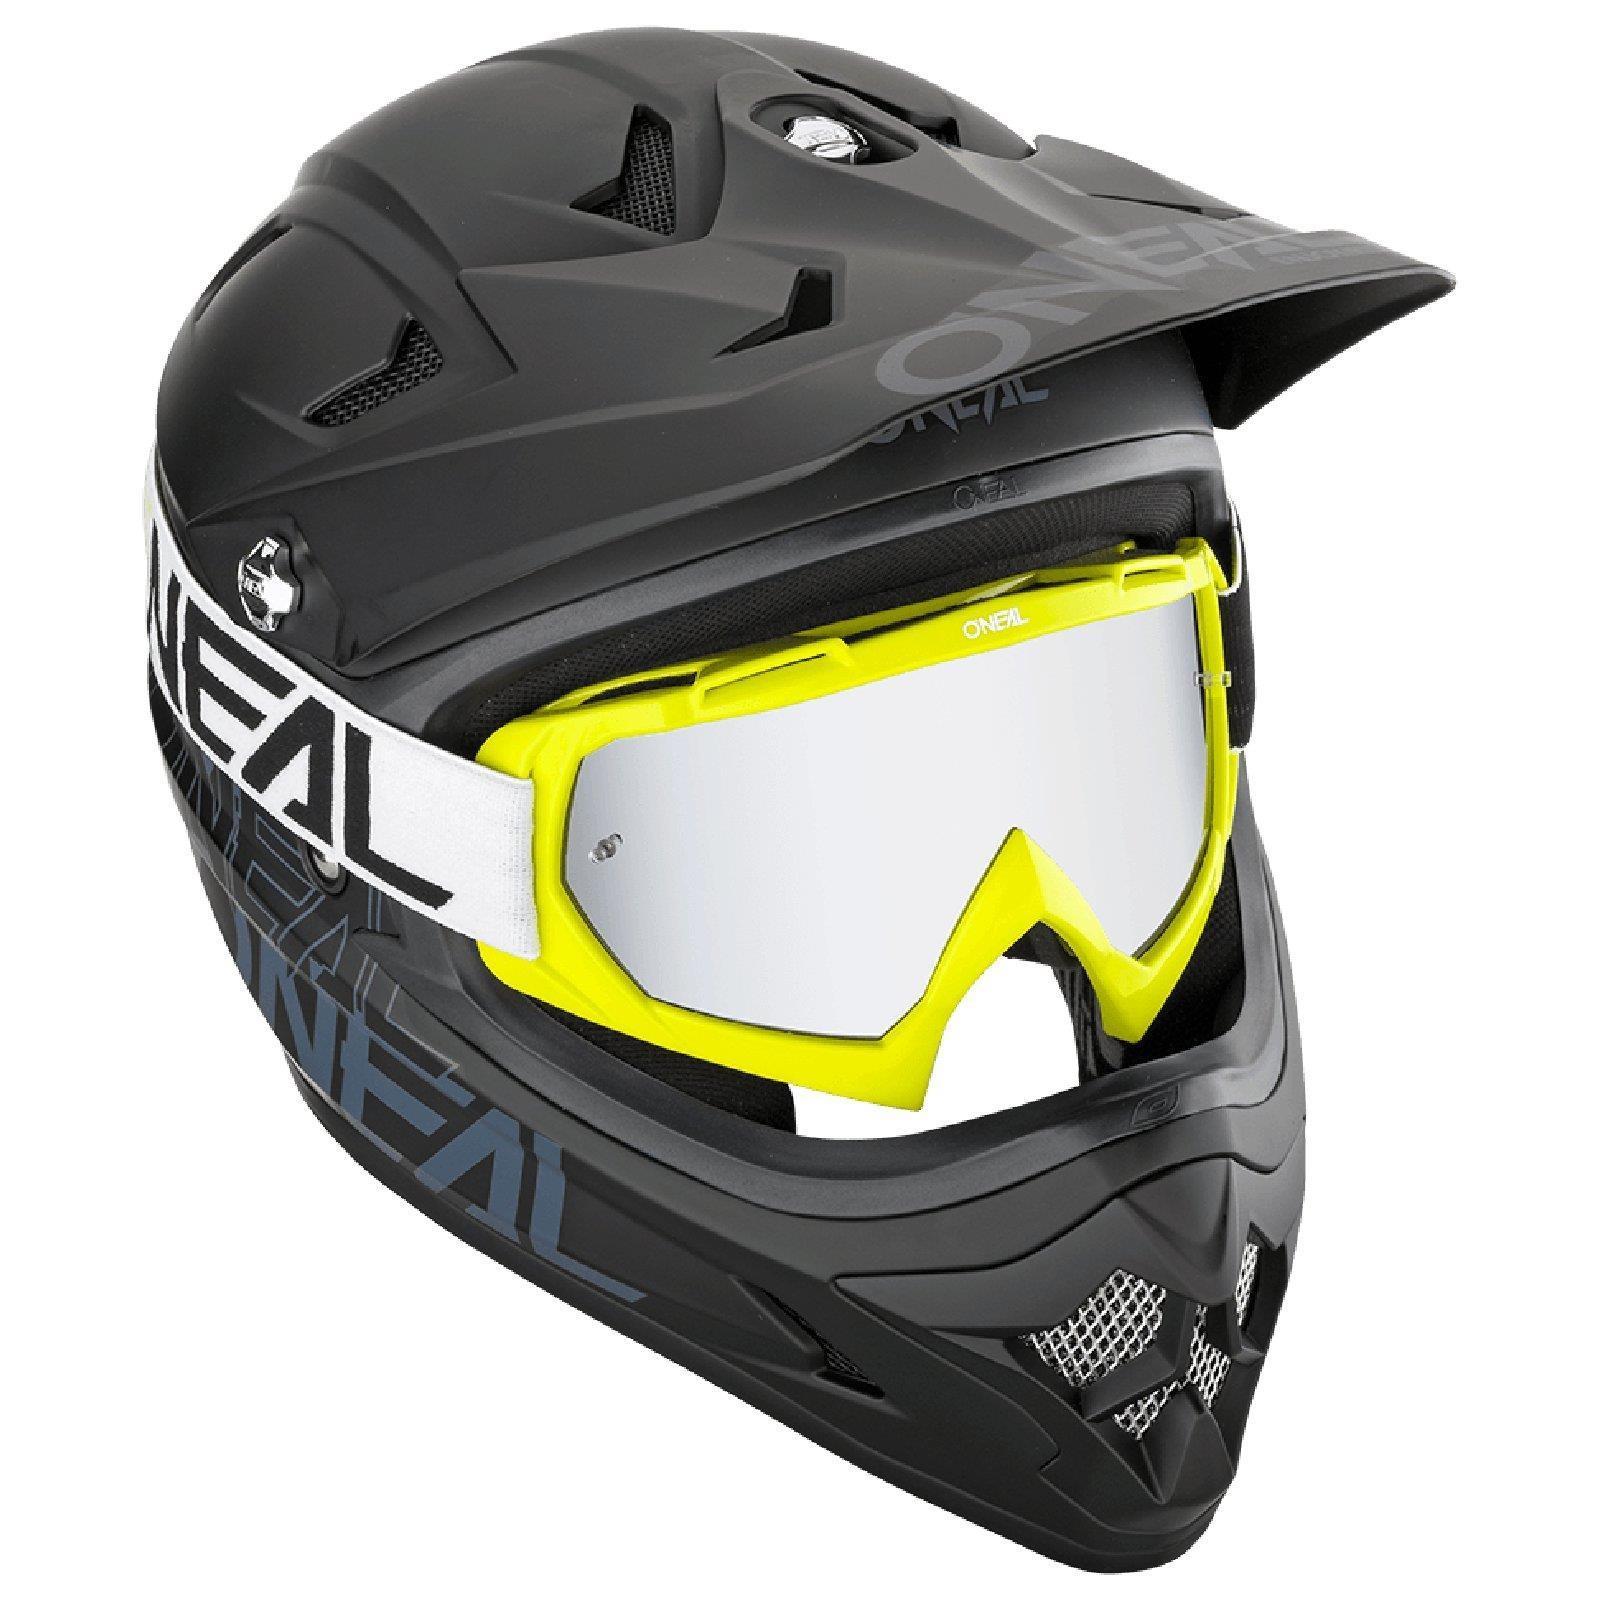 miniatuur 14 - O'Neal B-10 Goggle Twoface MX Brille Verspiegelt Silber Moto Cross Downhill MTB